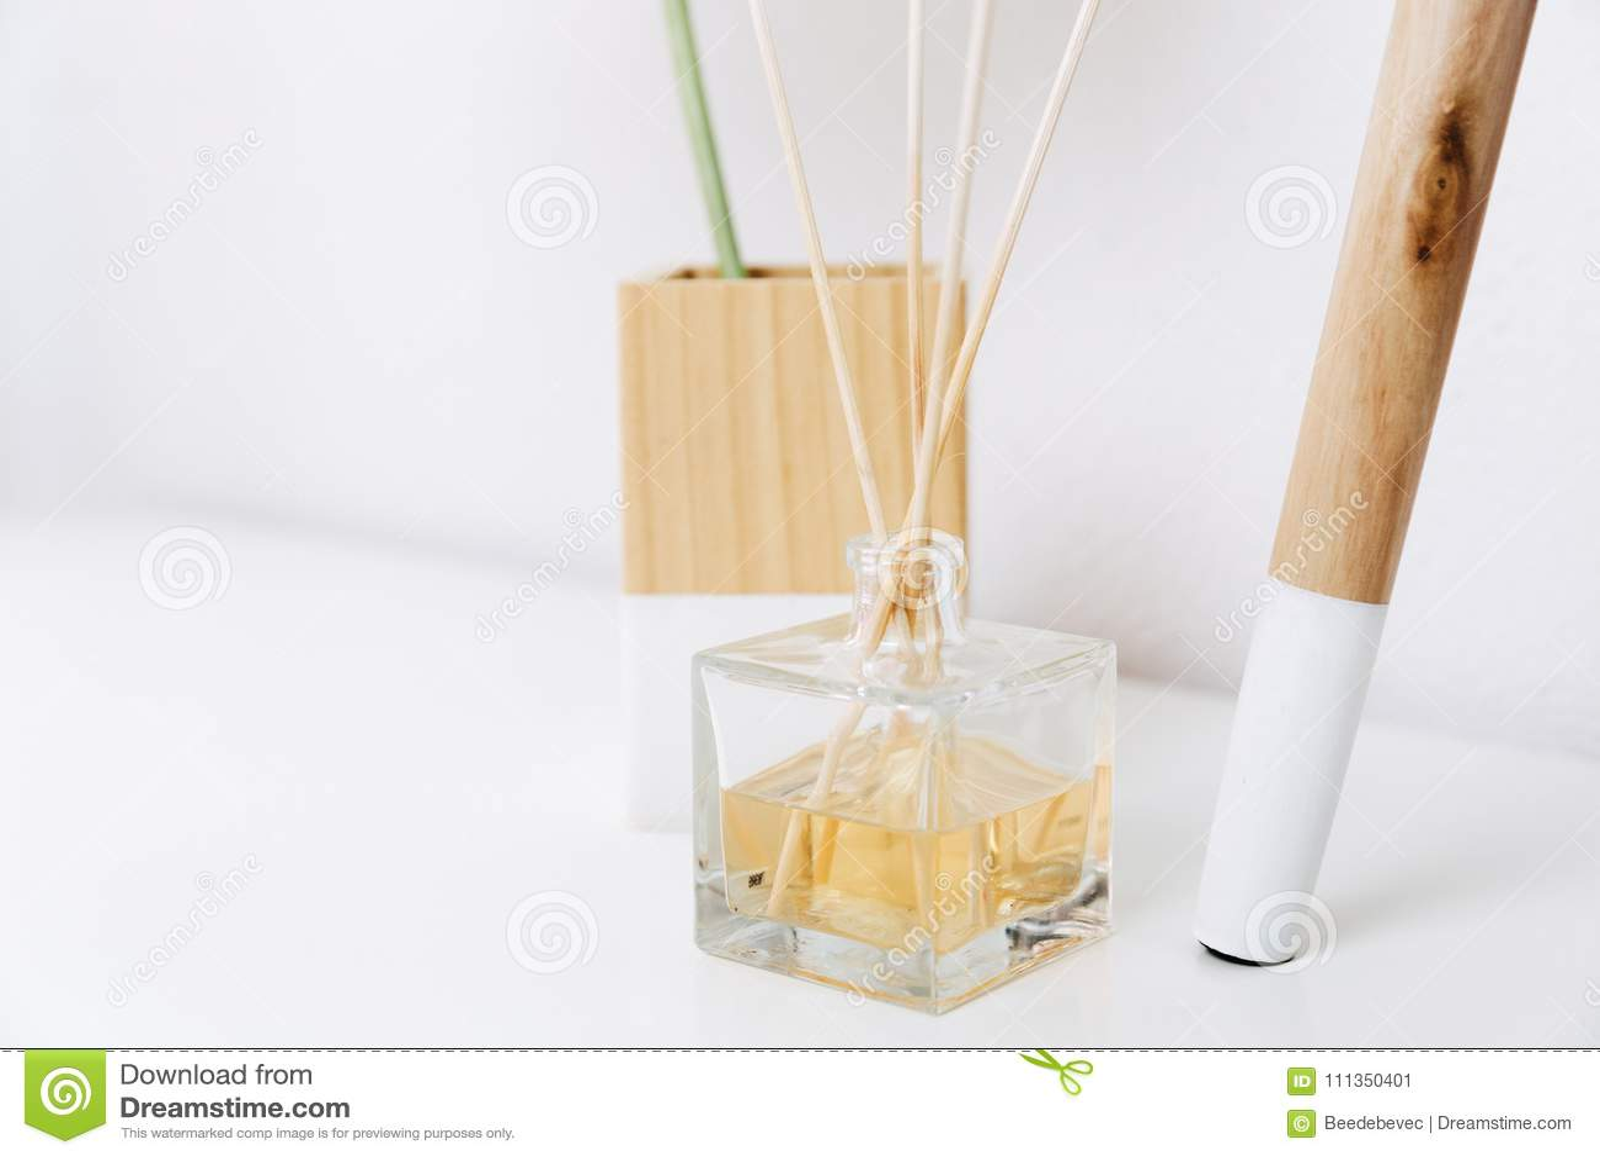 Home fragrance. Minimal decor living room